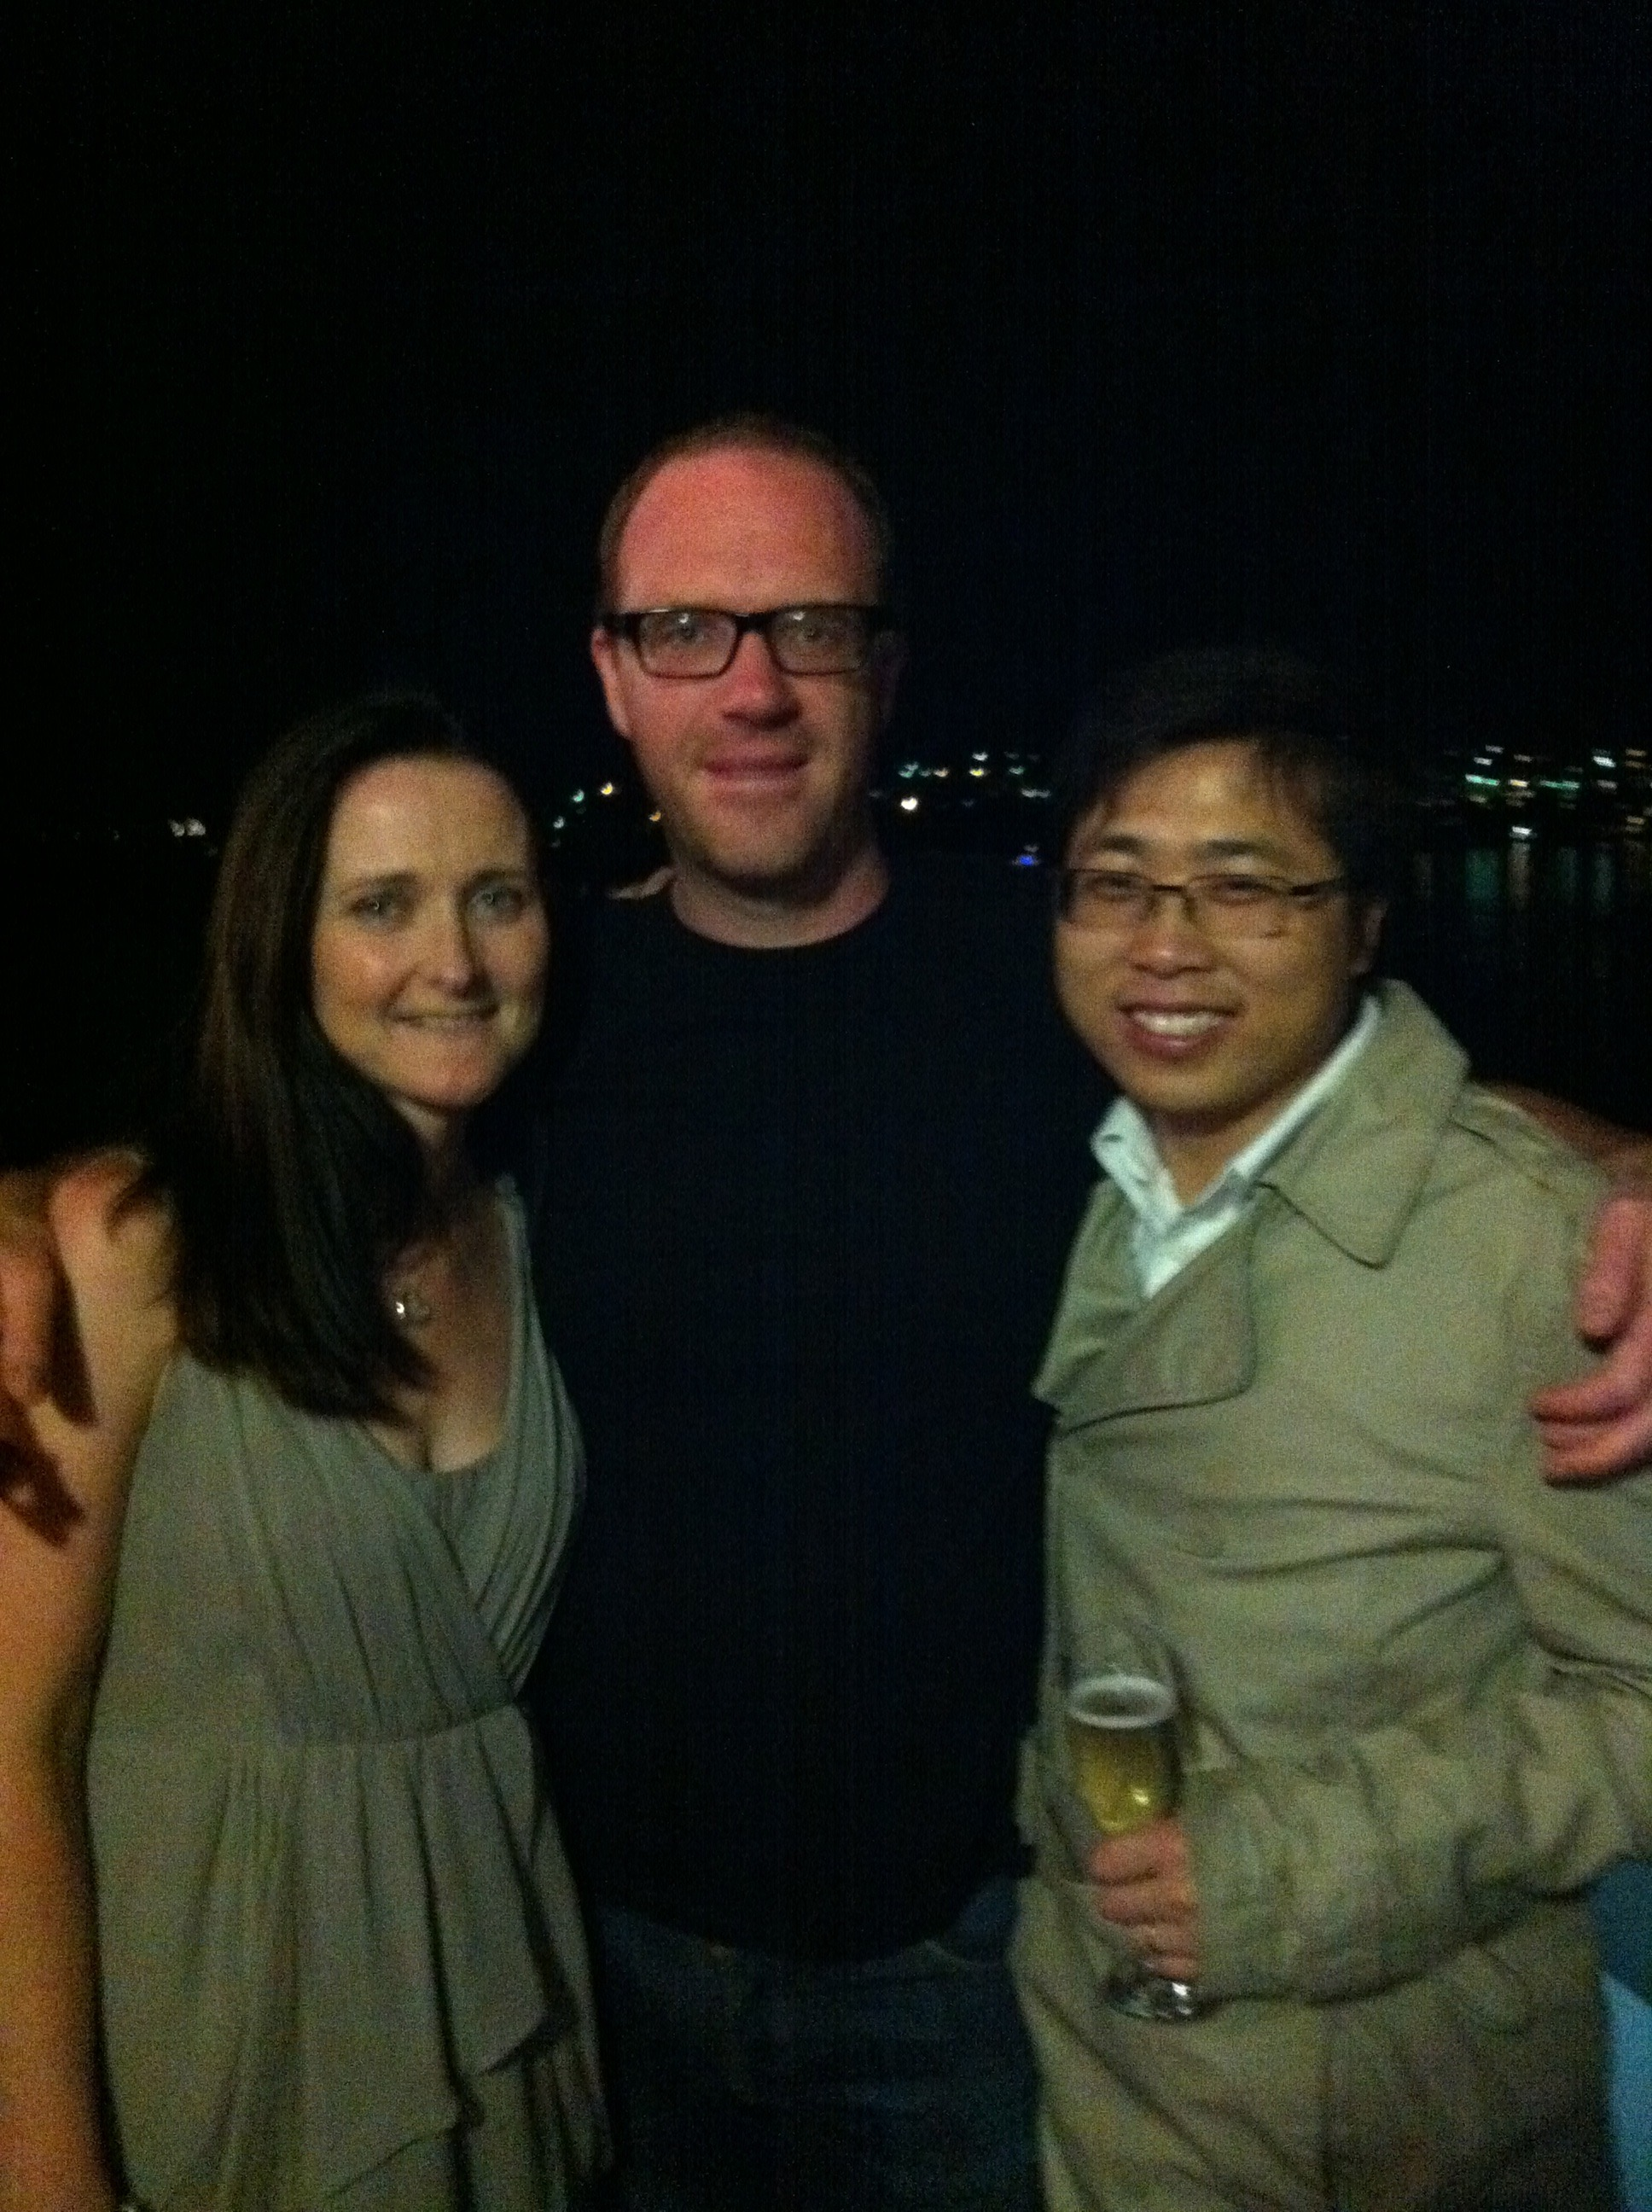 Felicity, Greg and Inspector Wang, Garvan Christmas party 2011